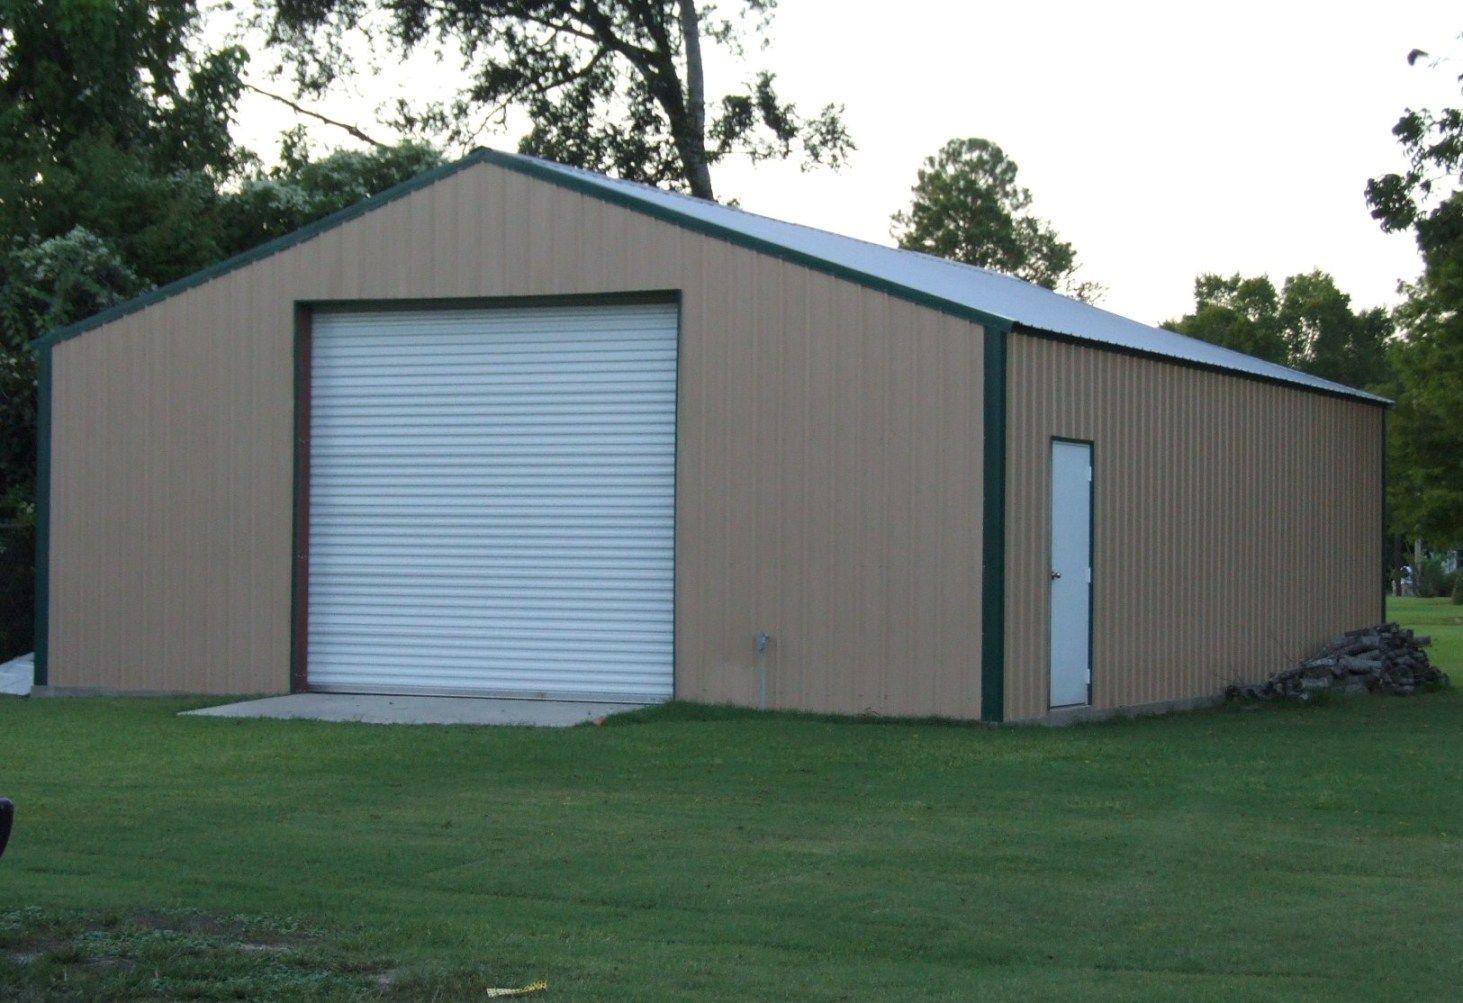 steel sheds design Metal Buildings into homes? (San